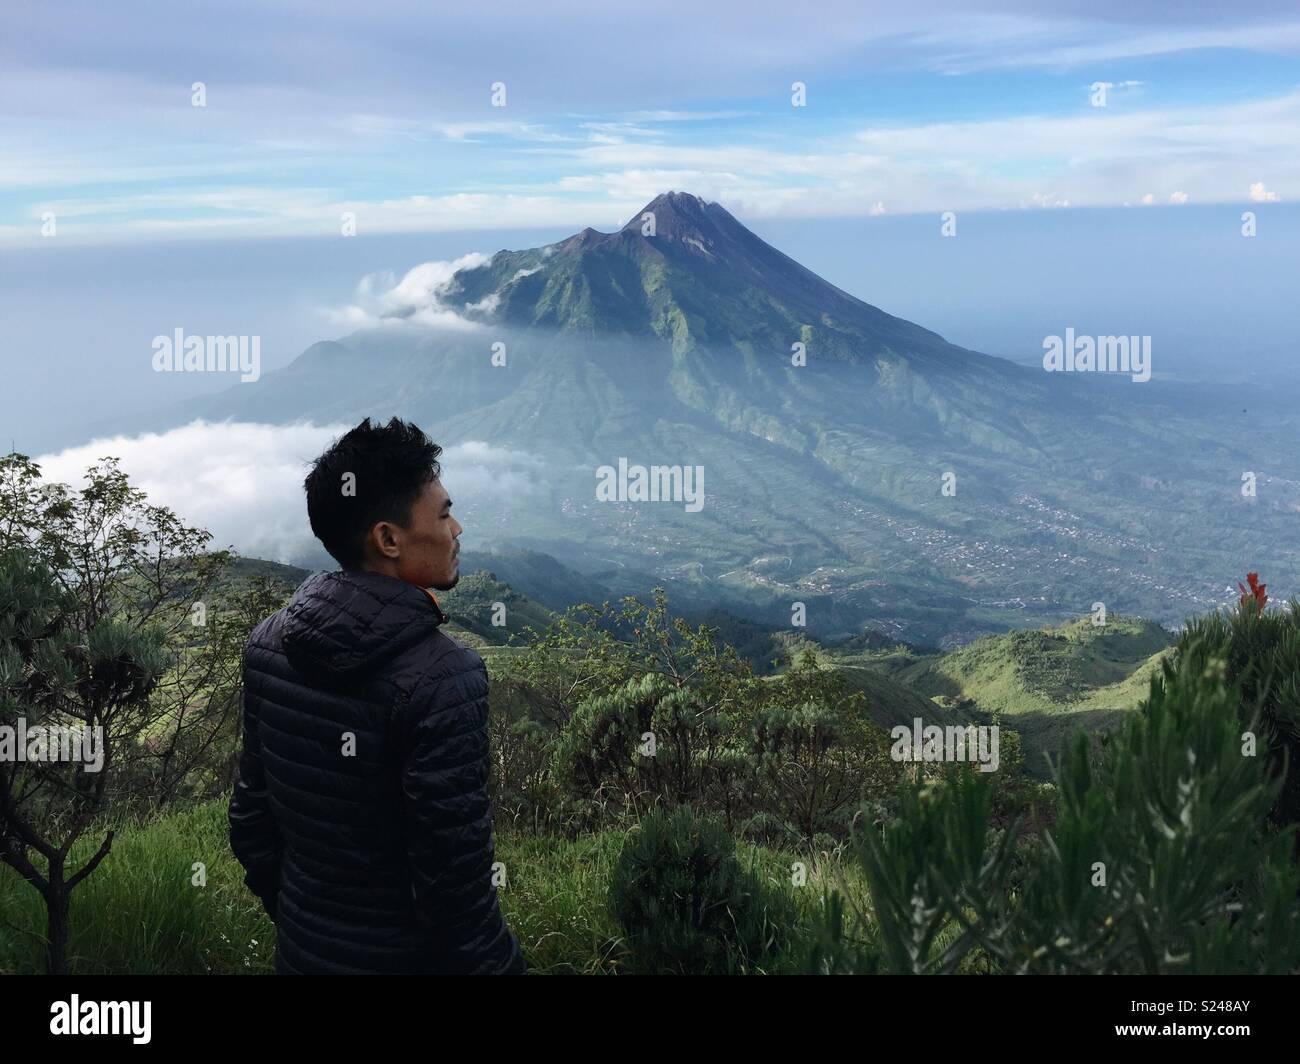 Mount Merapi from Mount Merbabu - Stock Image